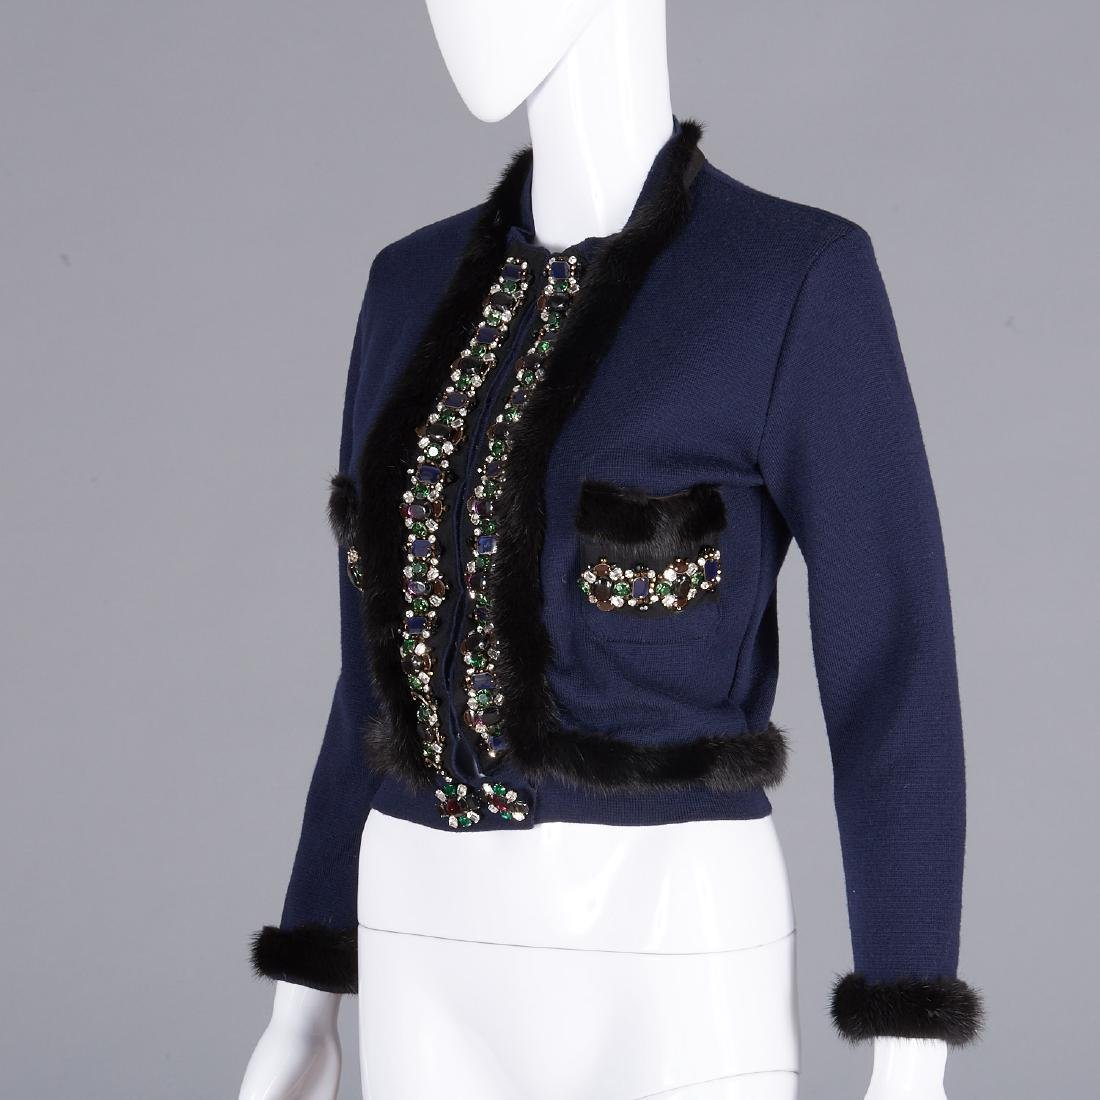 Gianfranco Ferre cardigan sweater